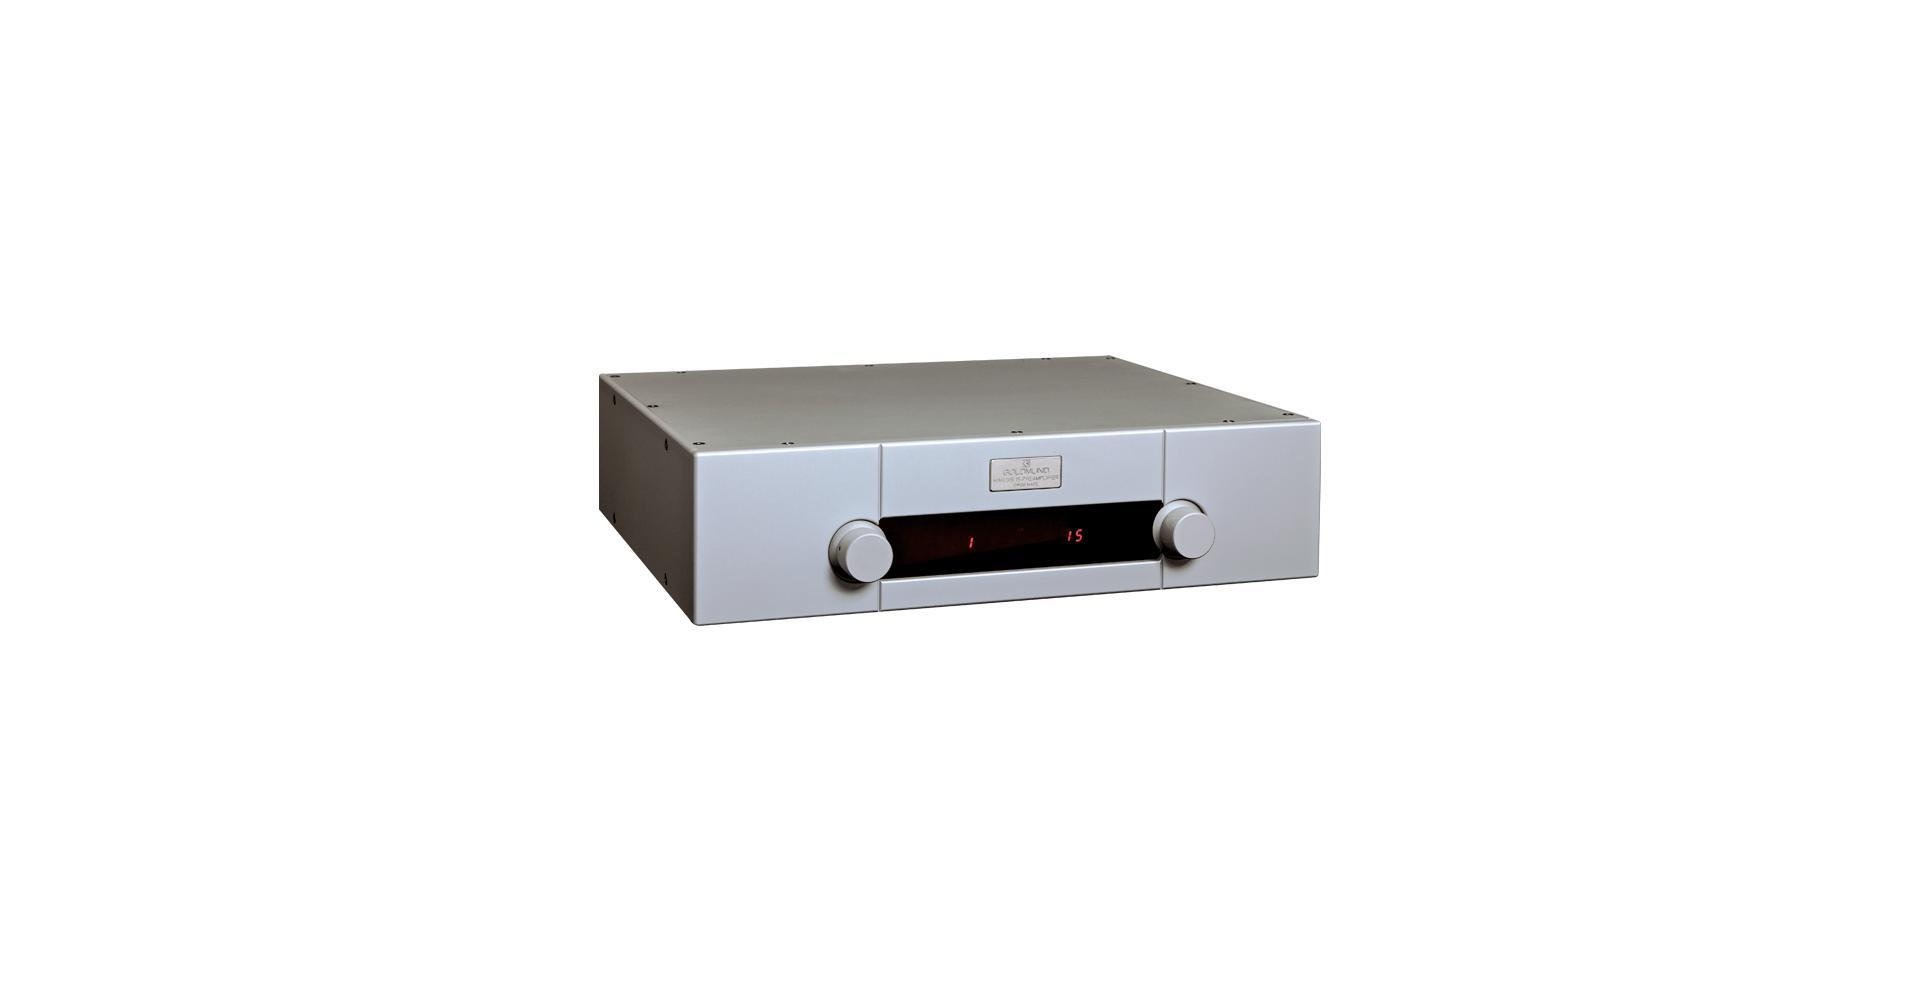 Mimesis 15 processor for home cinema